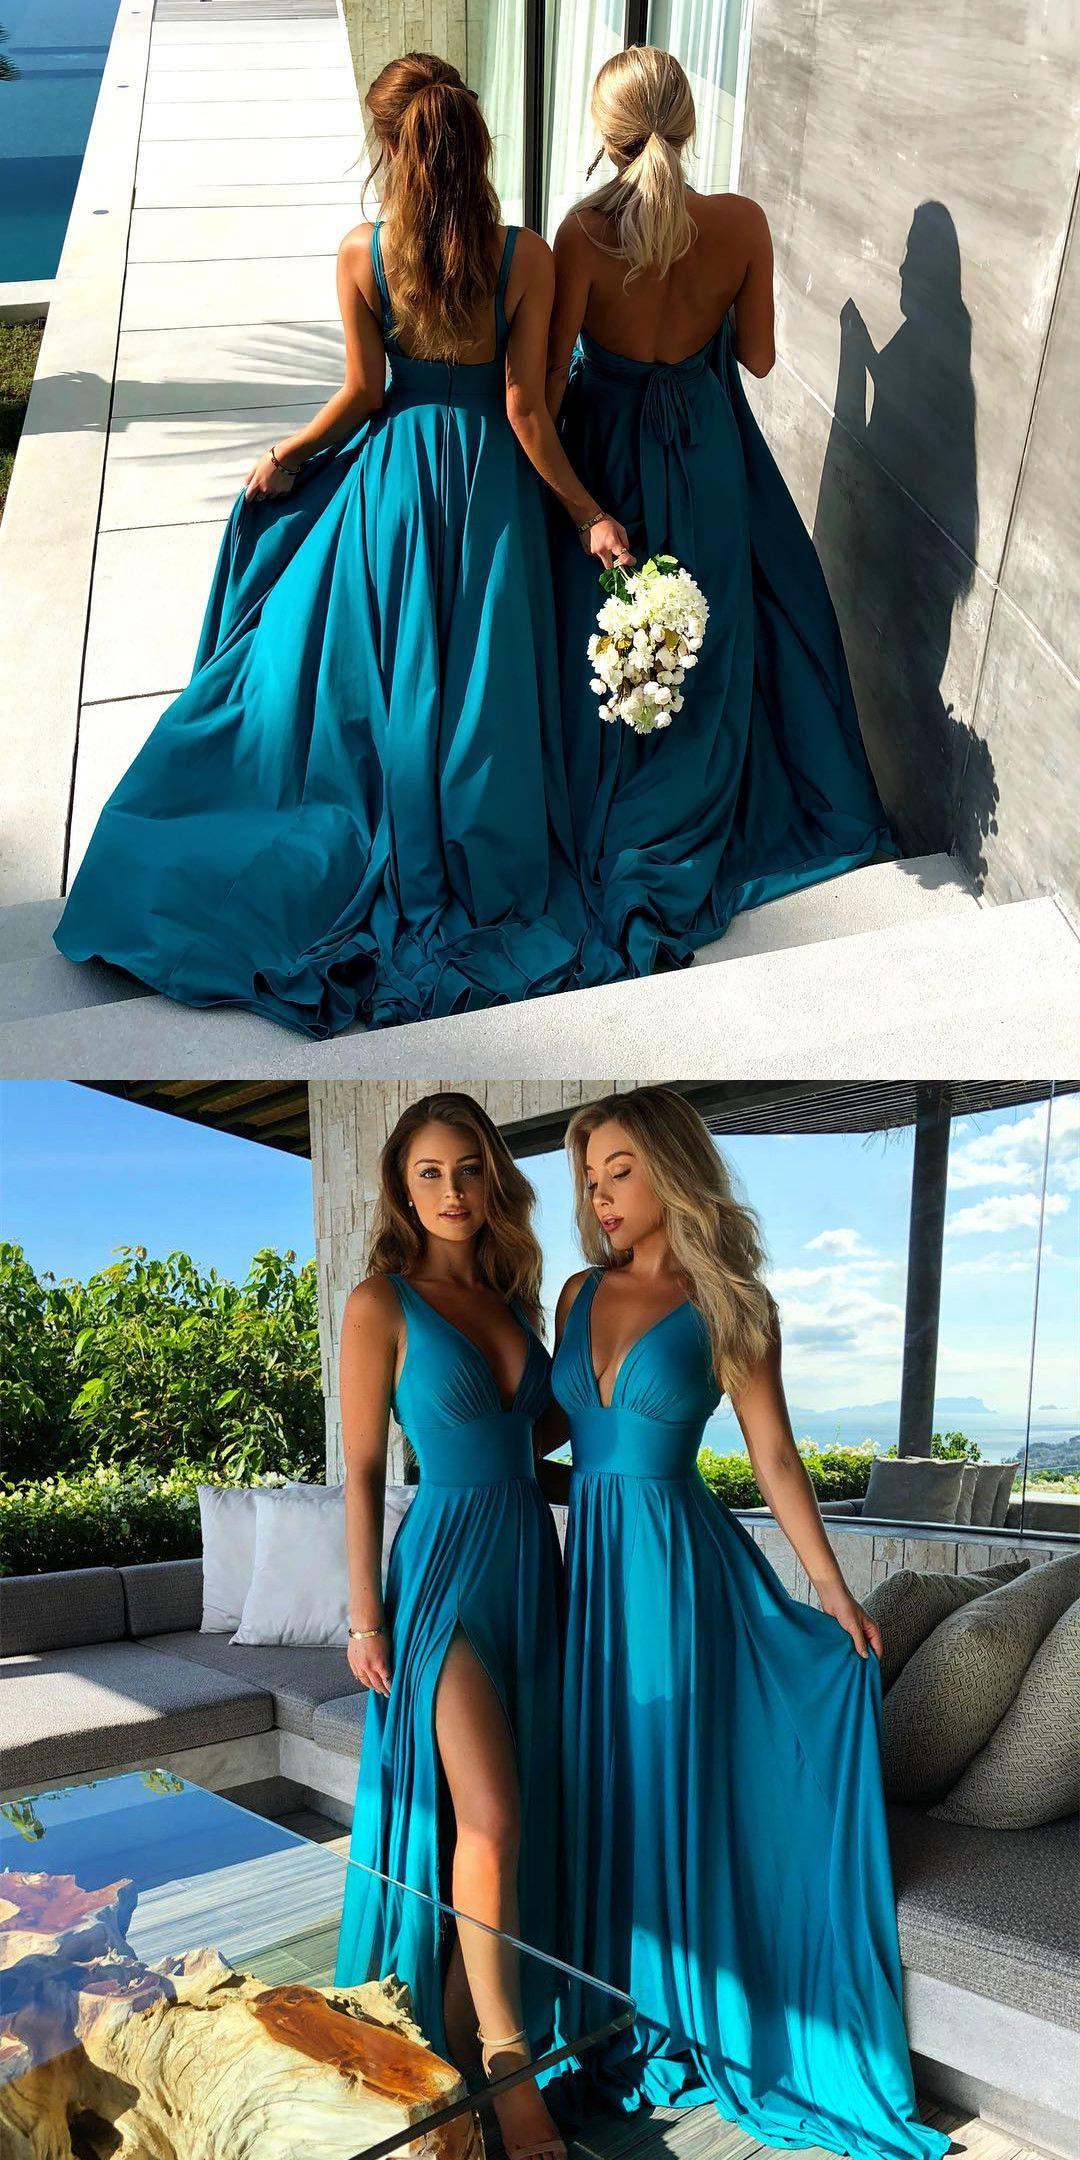 Aline vneck turquoise satin bridesmaid dress with split in